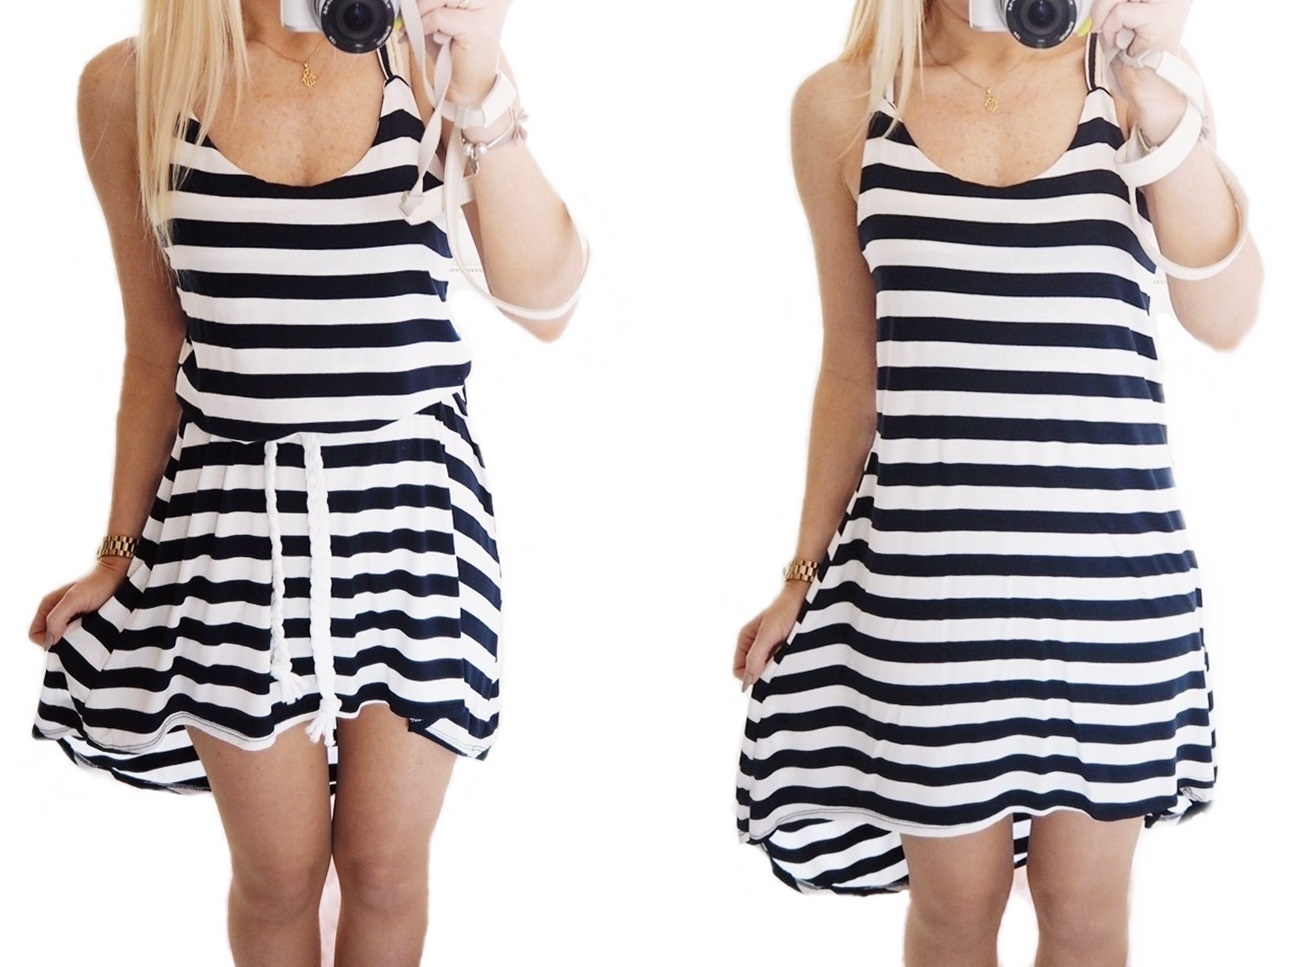 02bf439af2 Sale% Letnia sukienka marynarska PASY Granat biel - 7281435625 ...